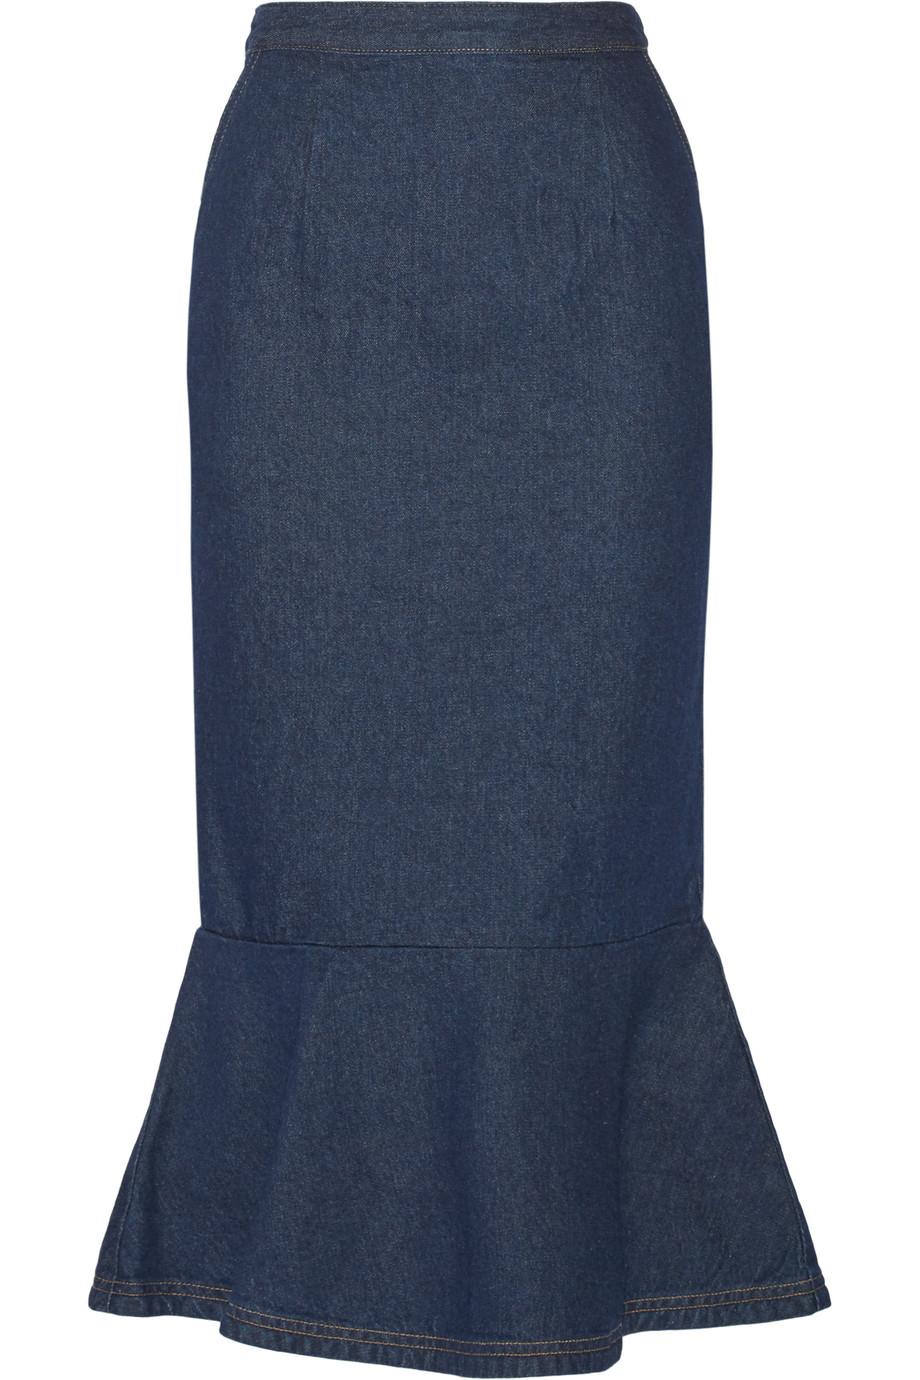 Ruffled Denim Midi Skirt, Steve J & Yoni P, Dark Denim, Women's, Size: L